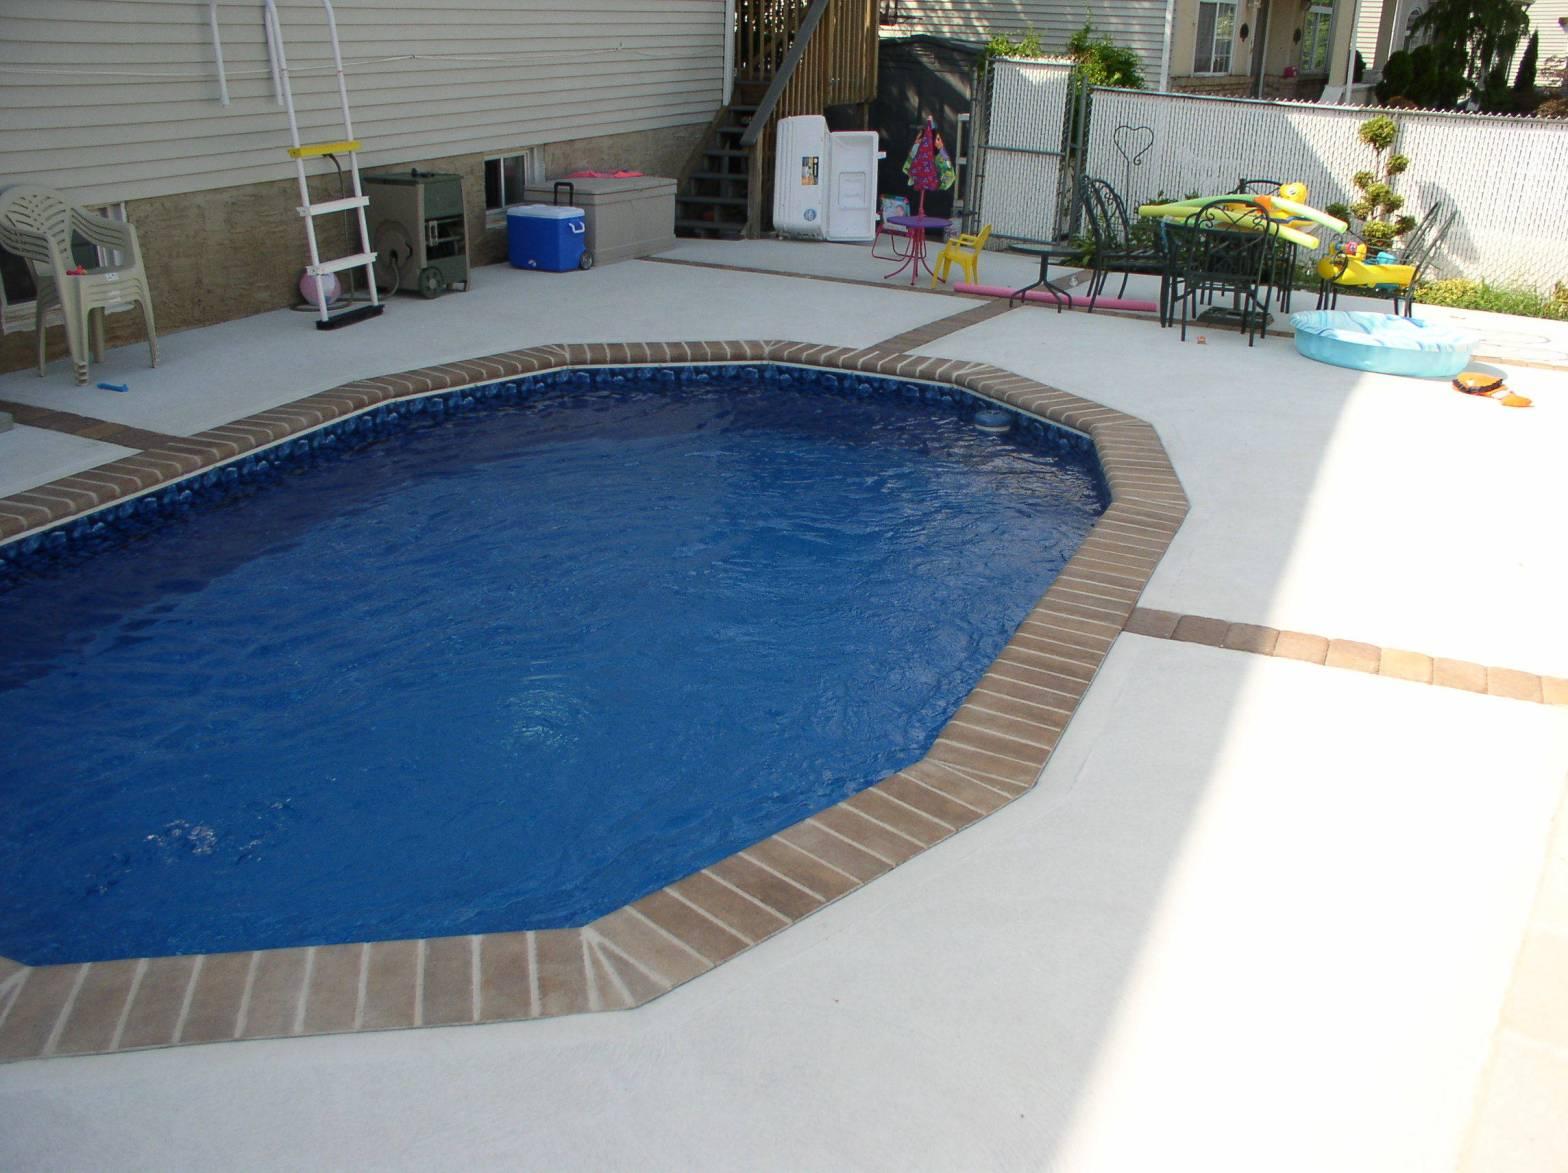 Aquasport 52 swimming pool